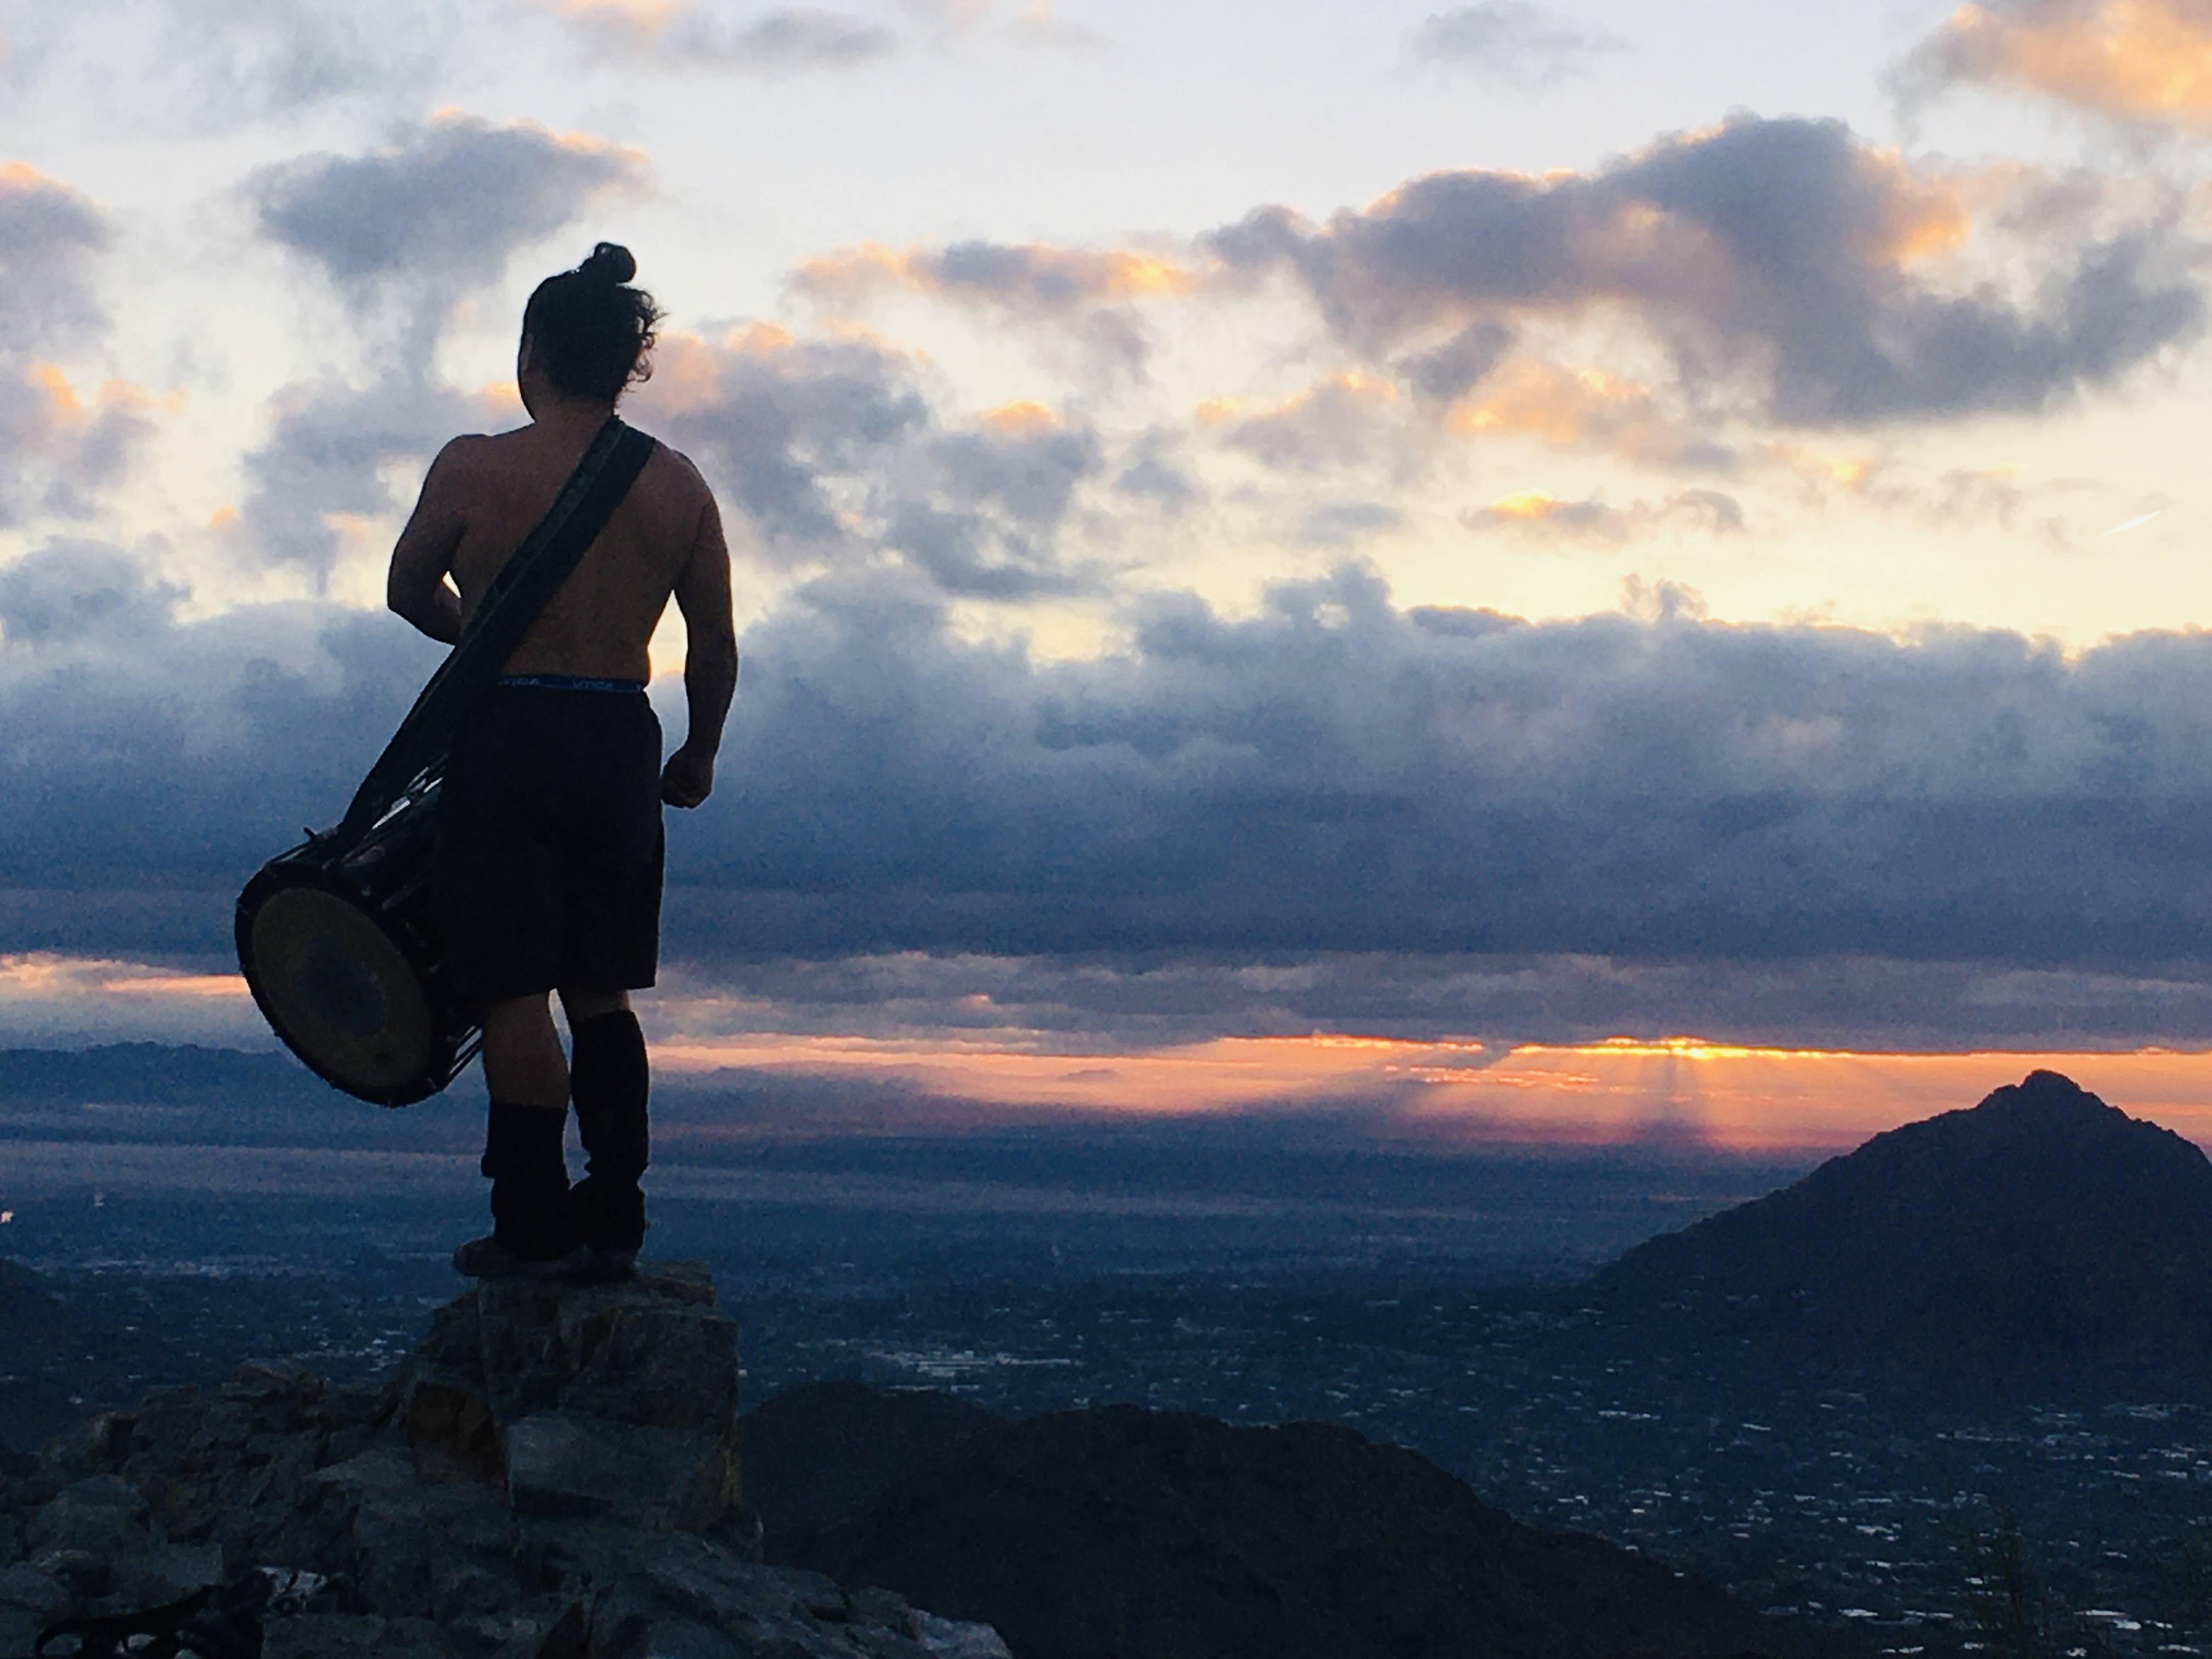 man playing drum on top of mountain